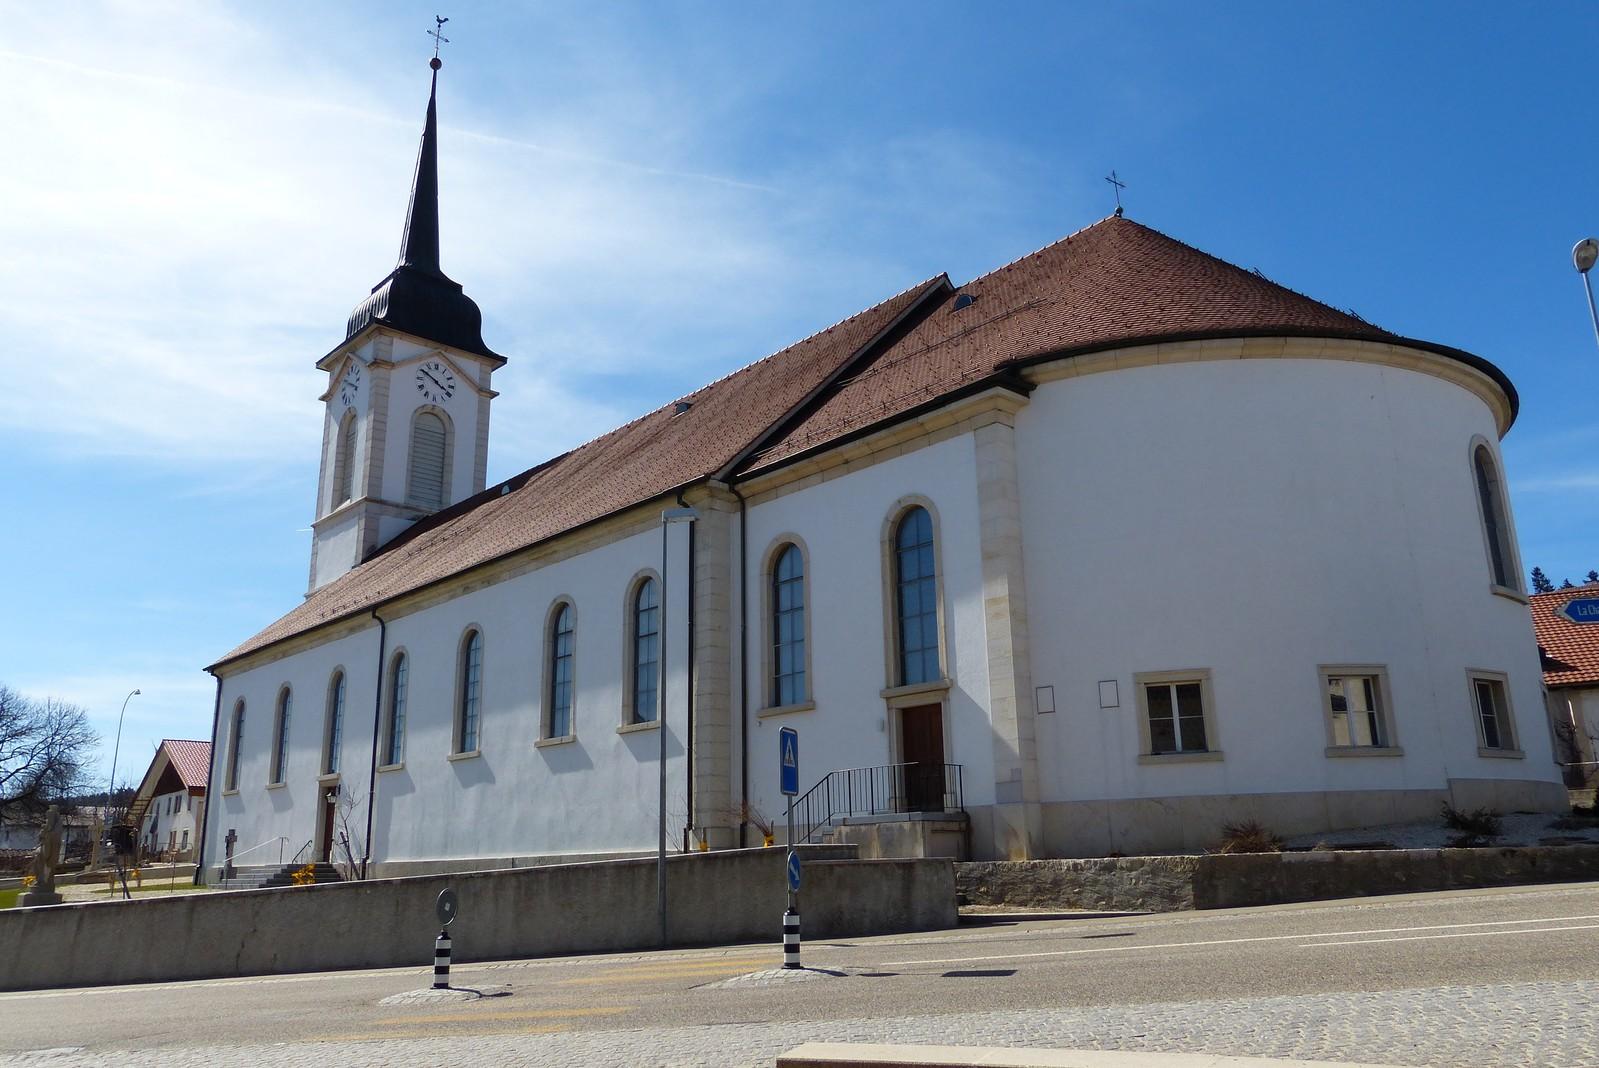 une vue de la faaade ouest. Photo Ancienne église Avant Travaux Façades Une Vue De La Faaade Ouest